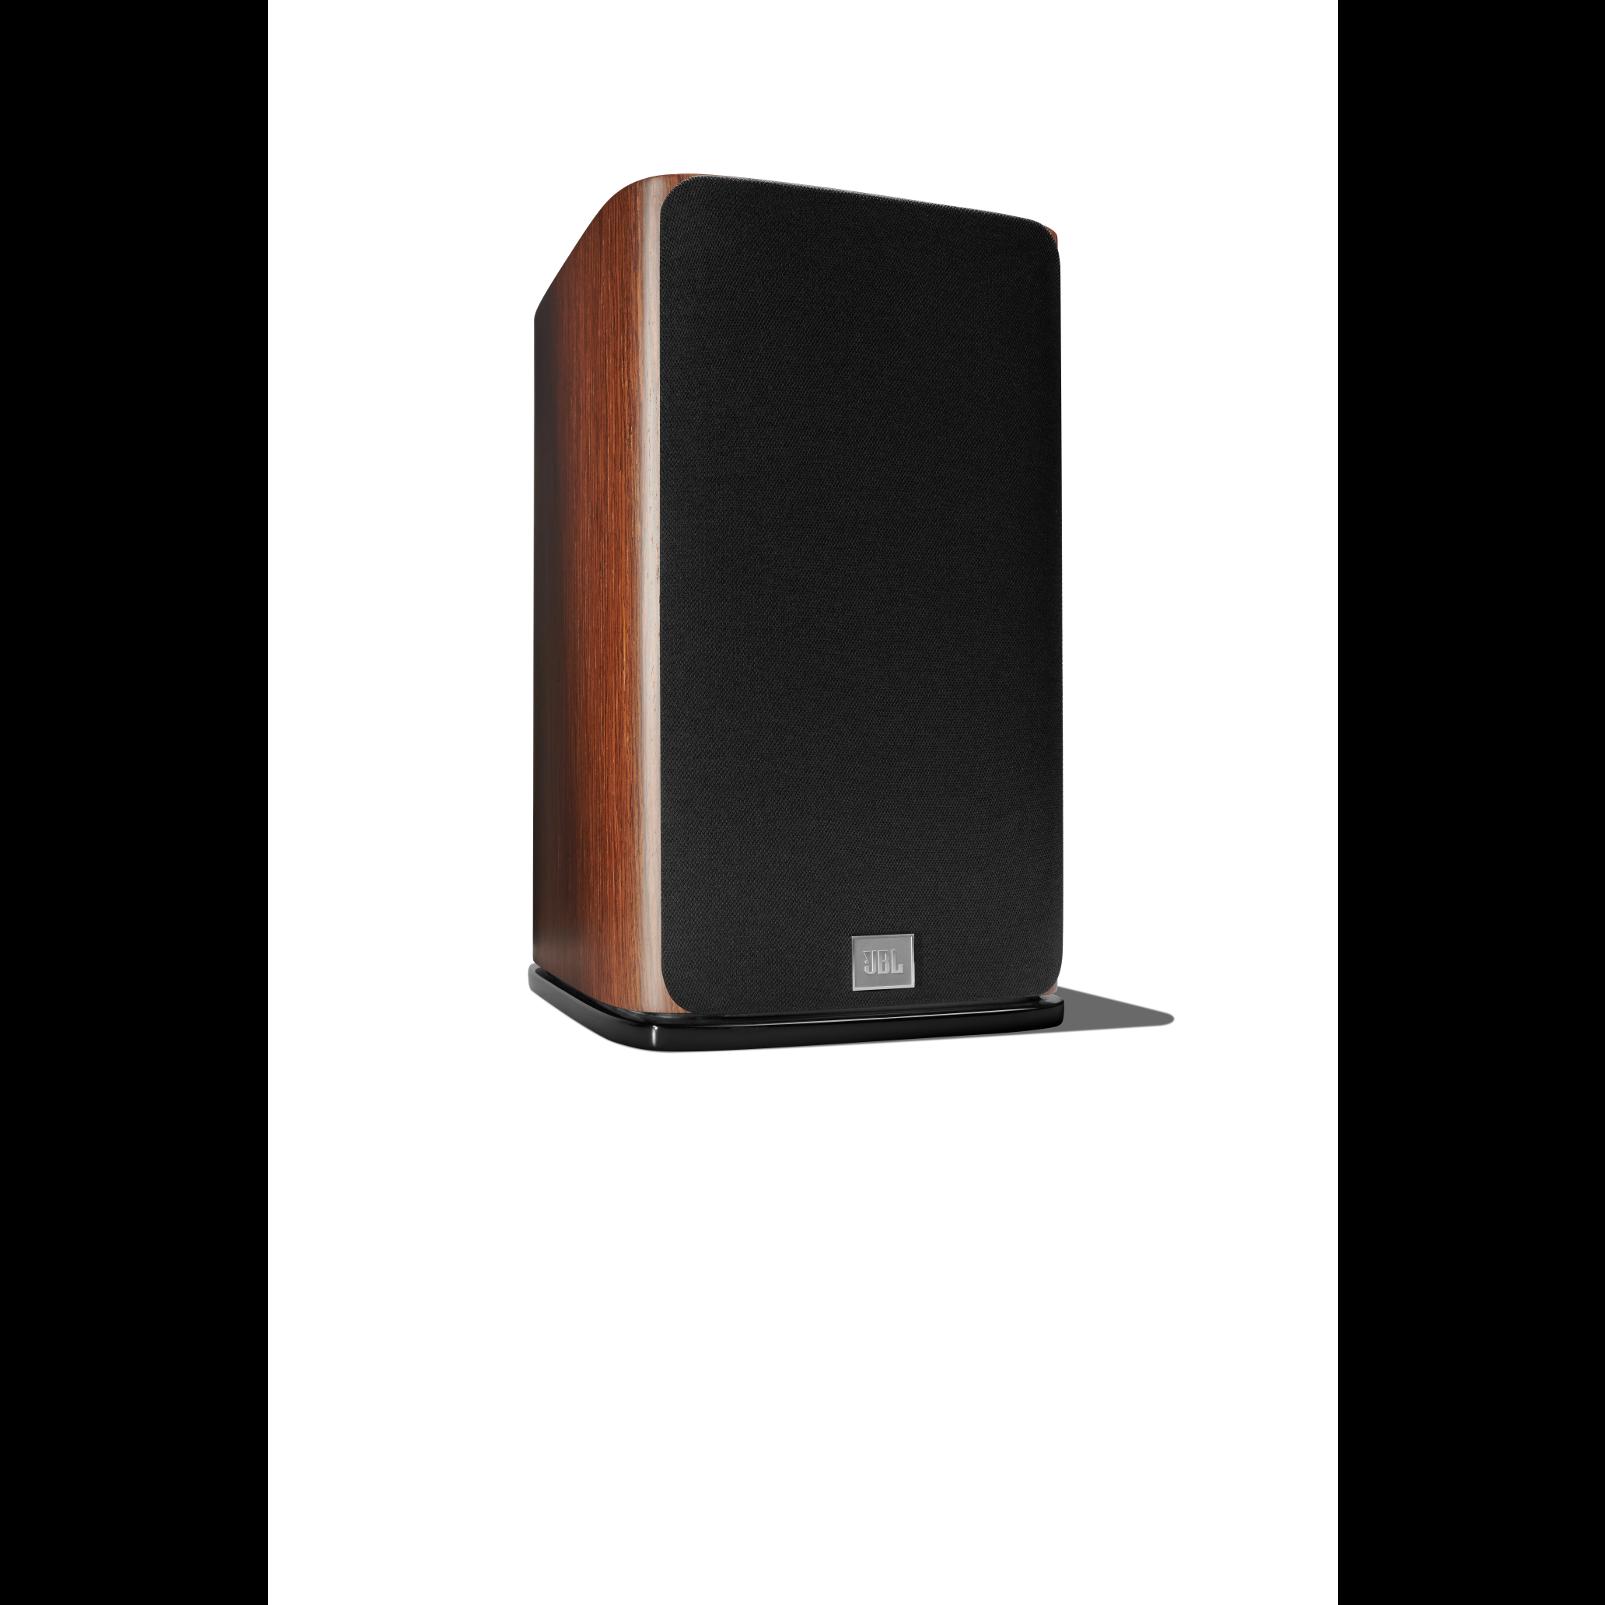 HDI-1600 - Walnut - 2-way 6.5-inch (165mm) Bookshelf Loudspeaker - Front